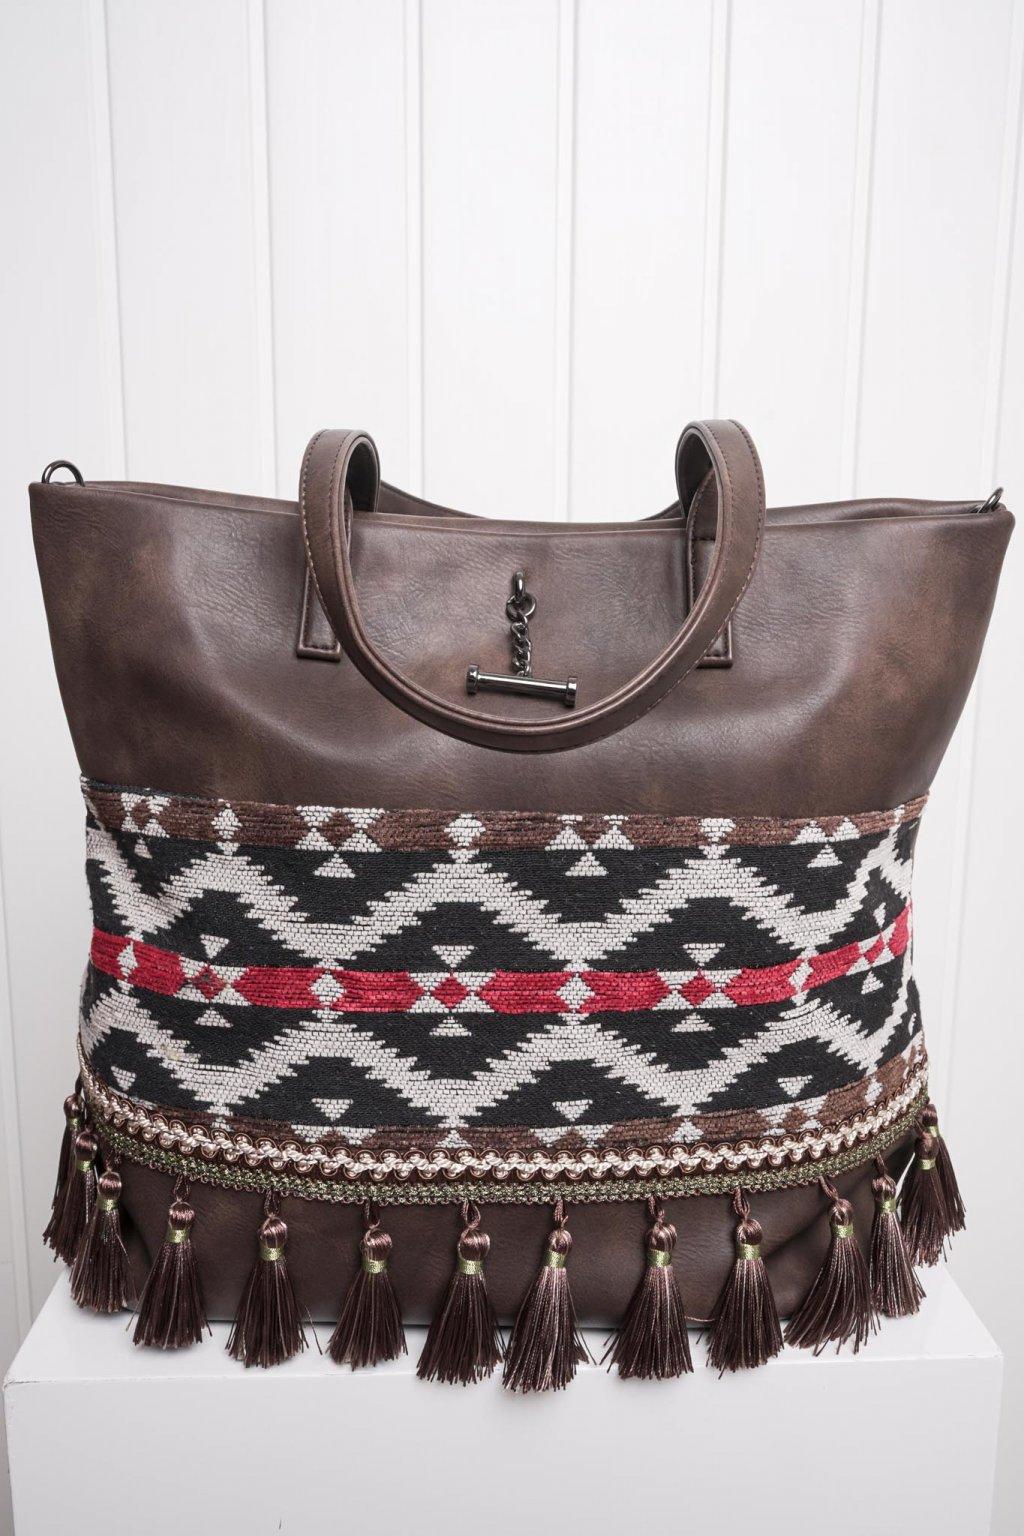 Kabelka, ruksak, dobrá cena, čierna kabelka, čierny ruksak, basic, kabelky, ruksaky 062